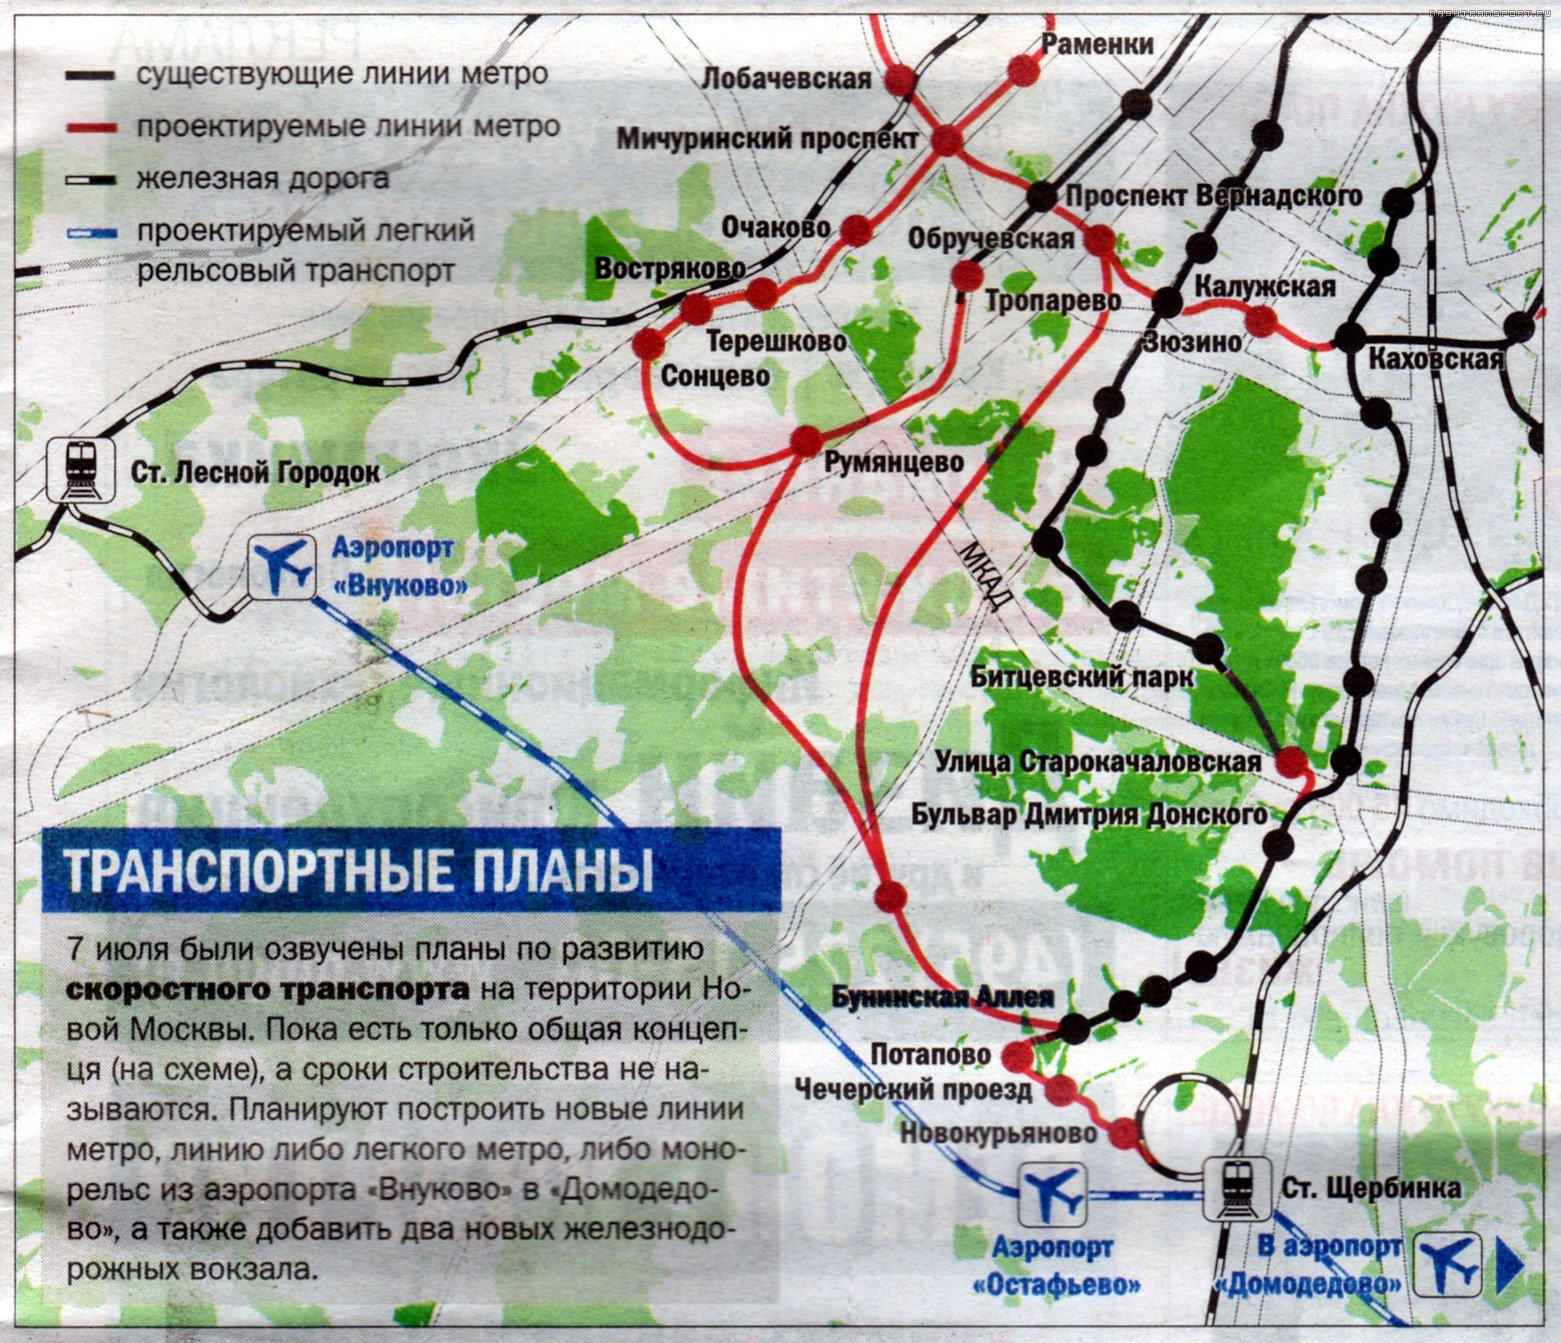 Метро москвы план развития 23 фотография